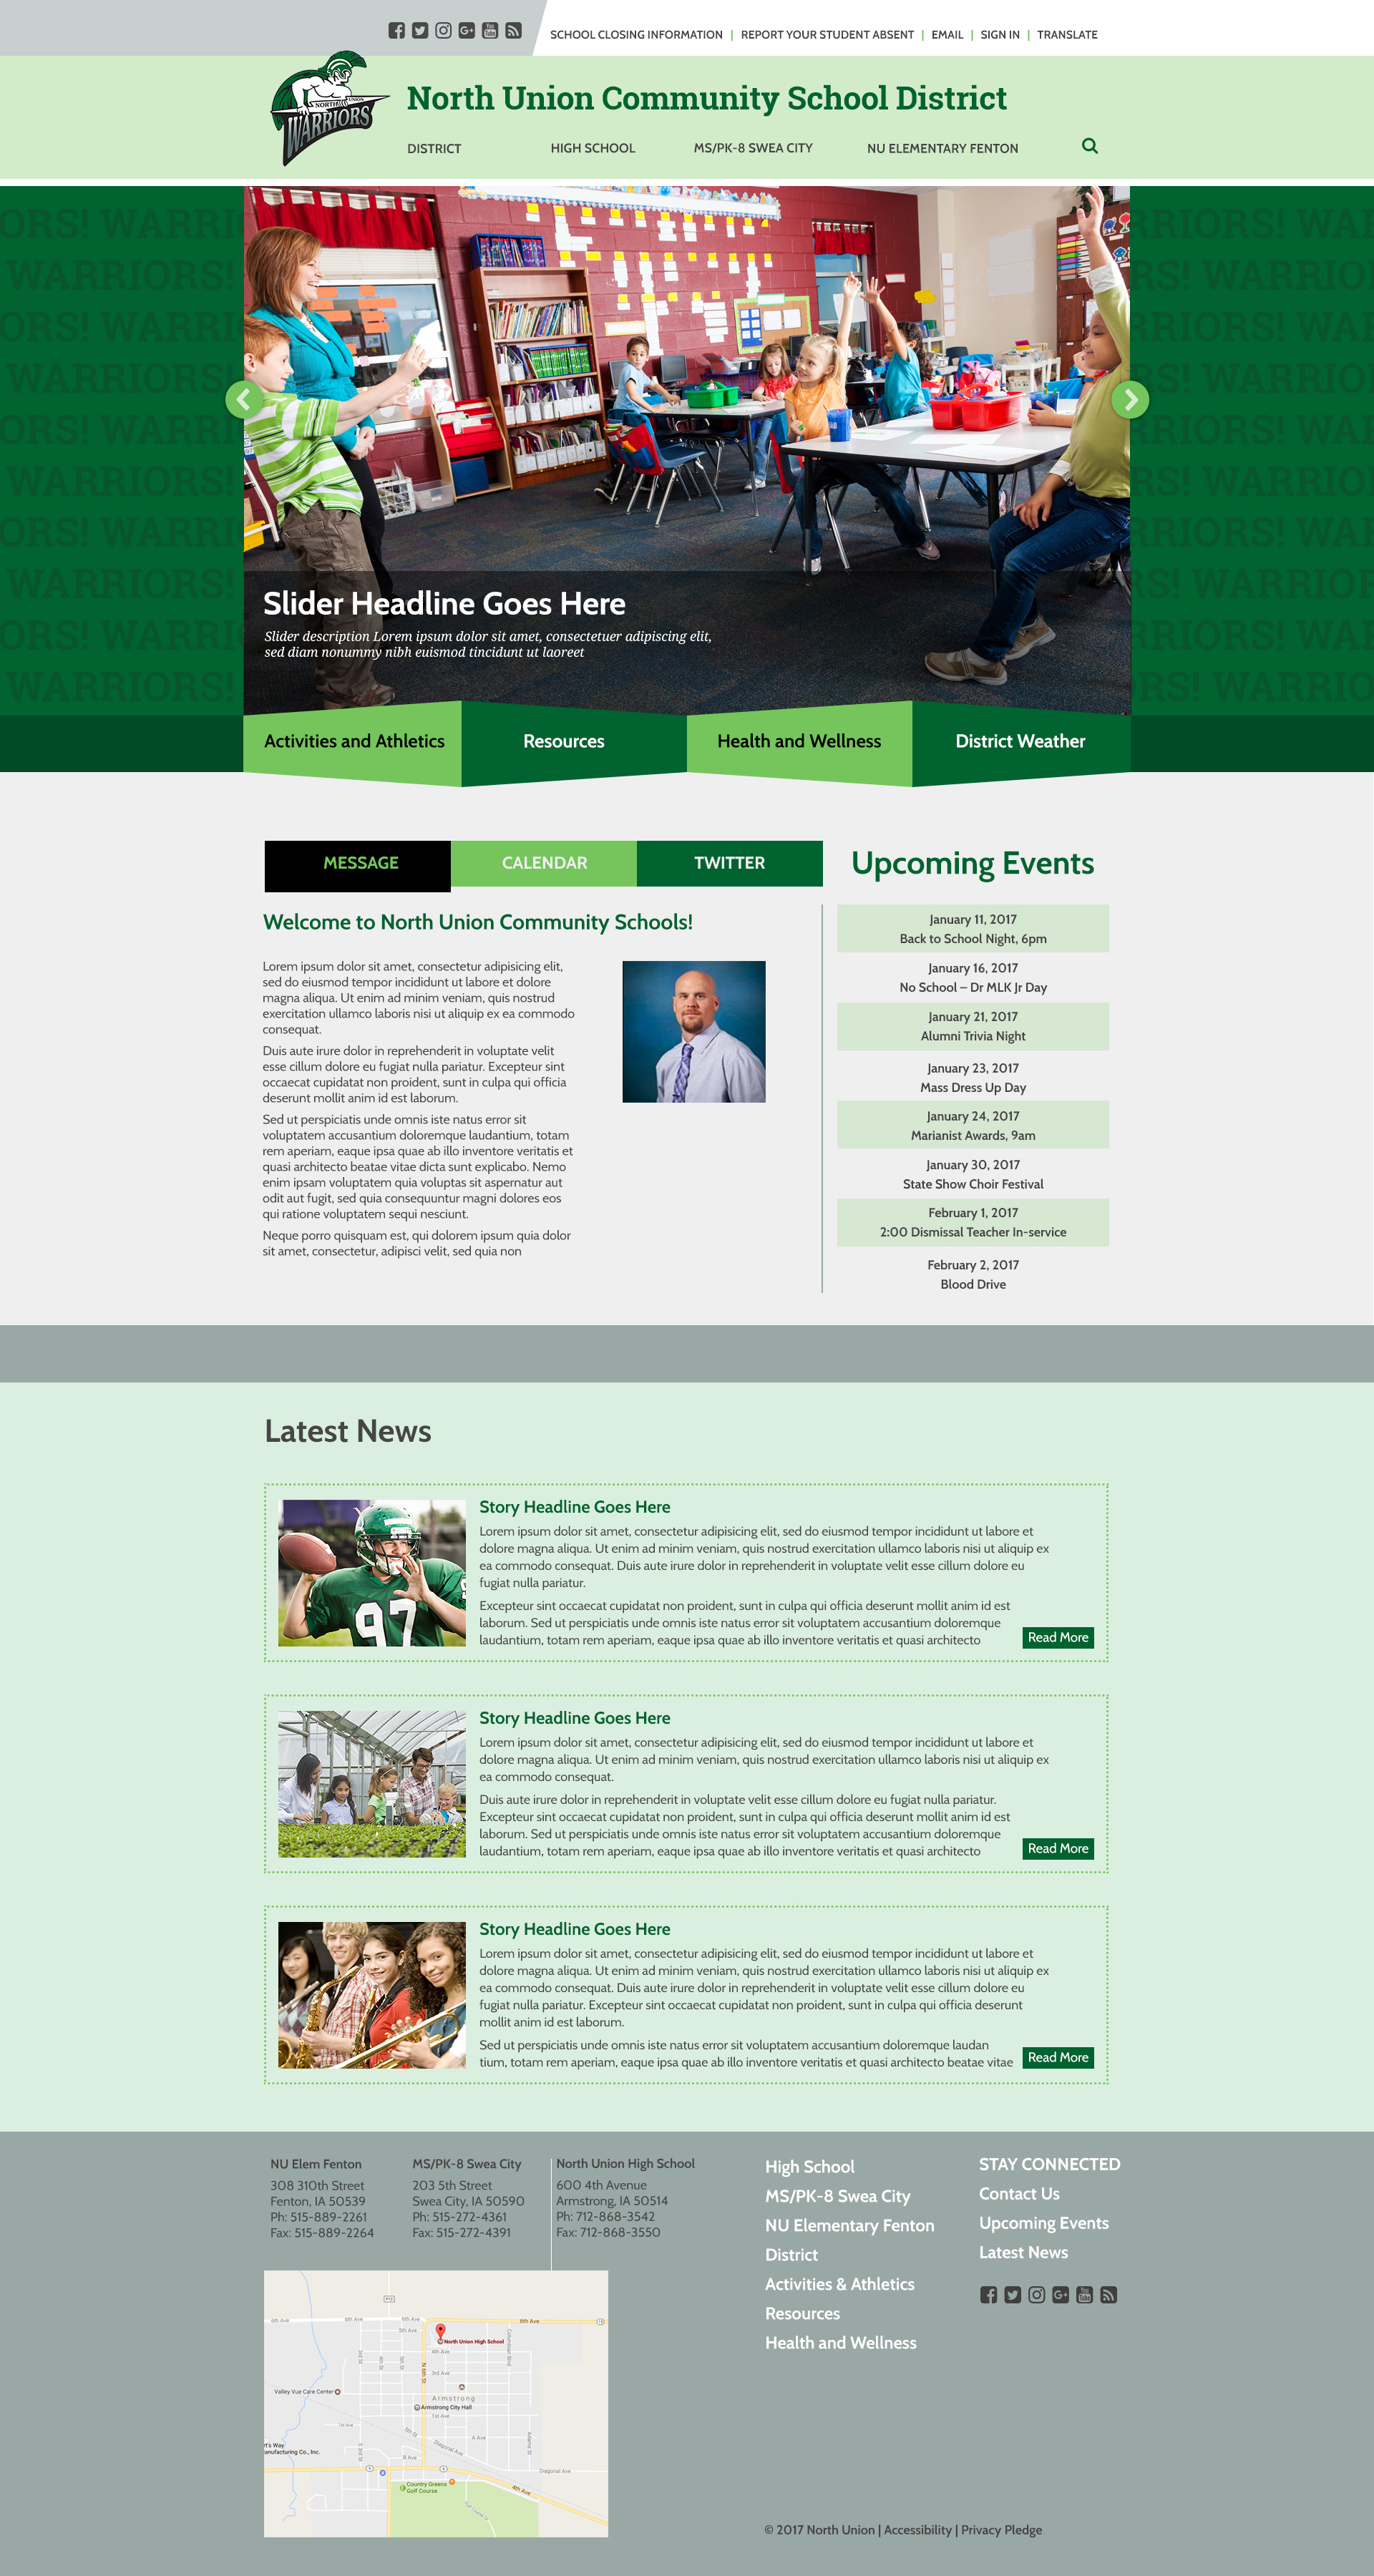 Design #1 - Homepage